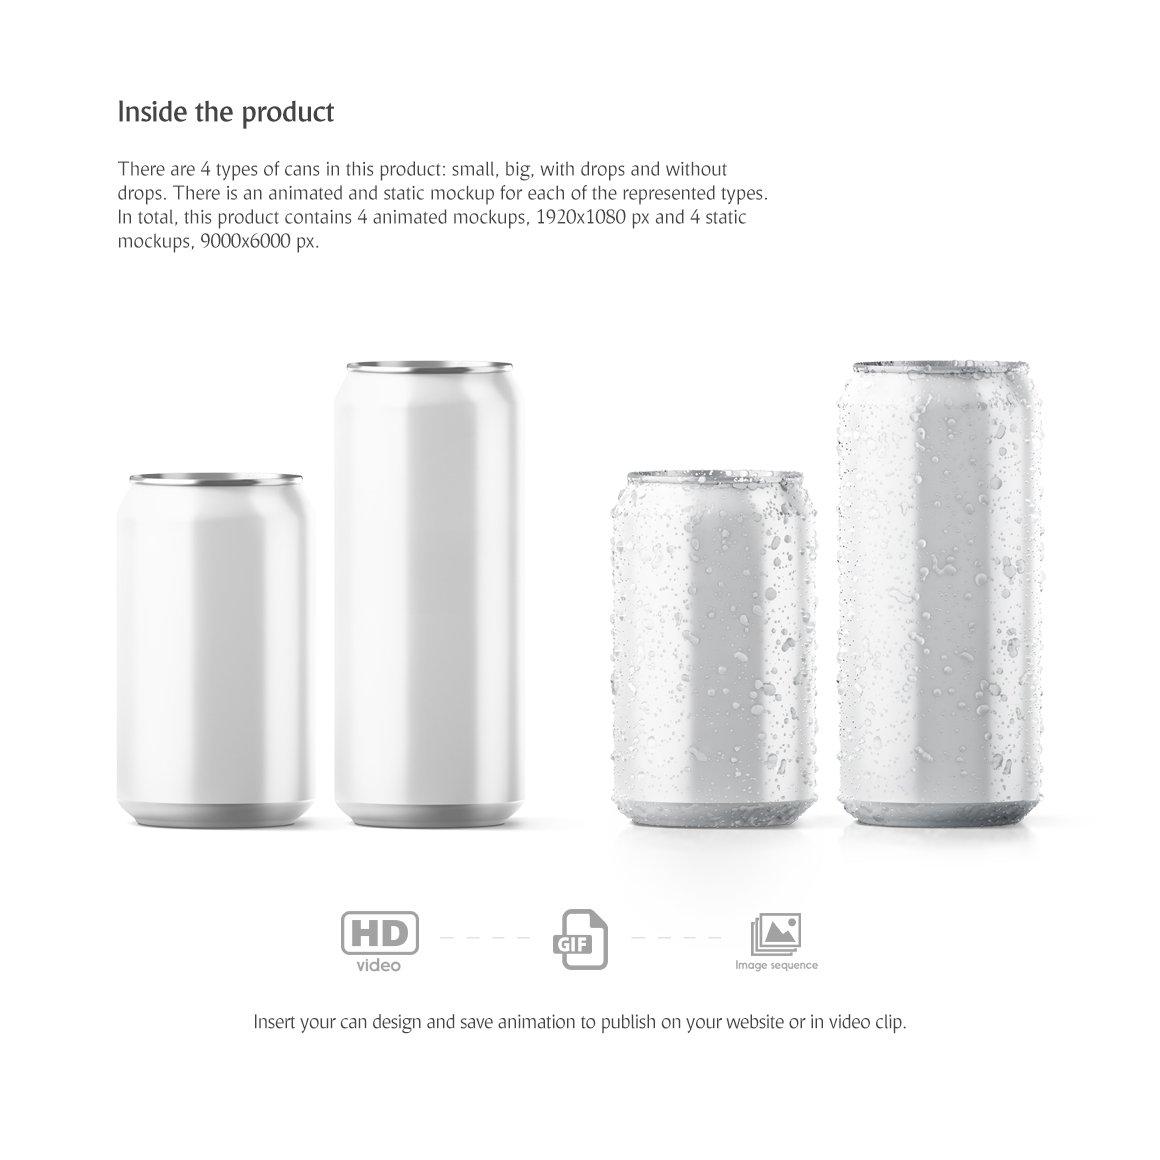 饮料汽水易拉罐锡罐设计动态展示样机 Soda Can Animated Mockup插图(2)